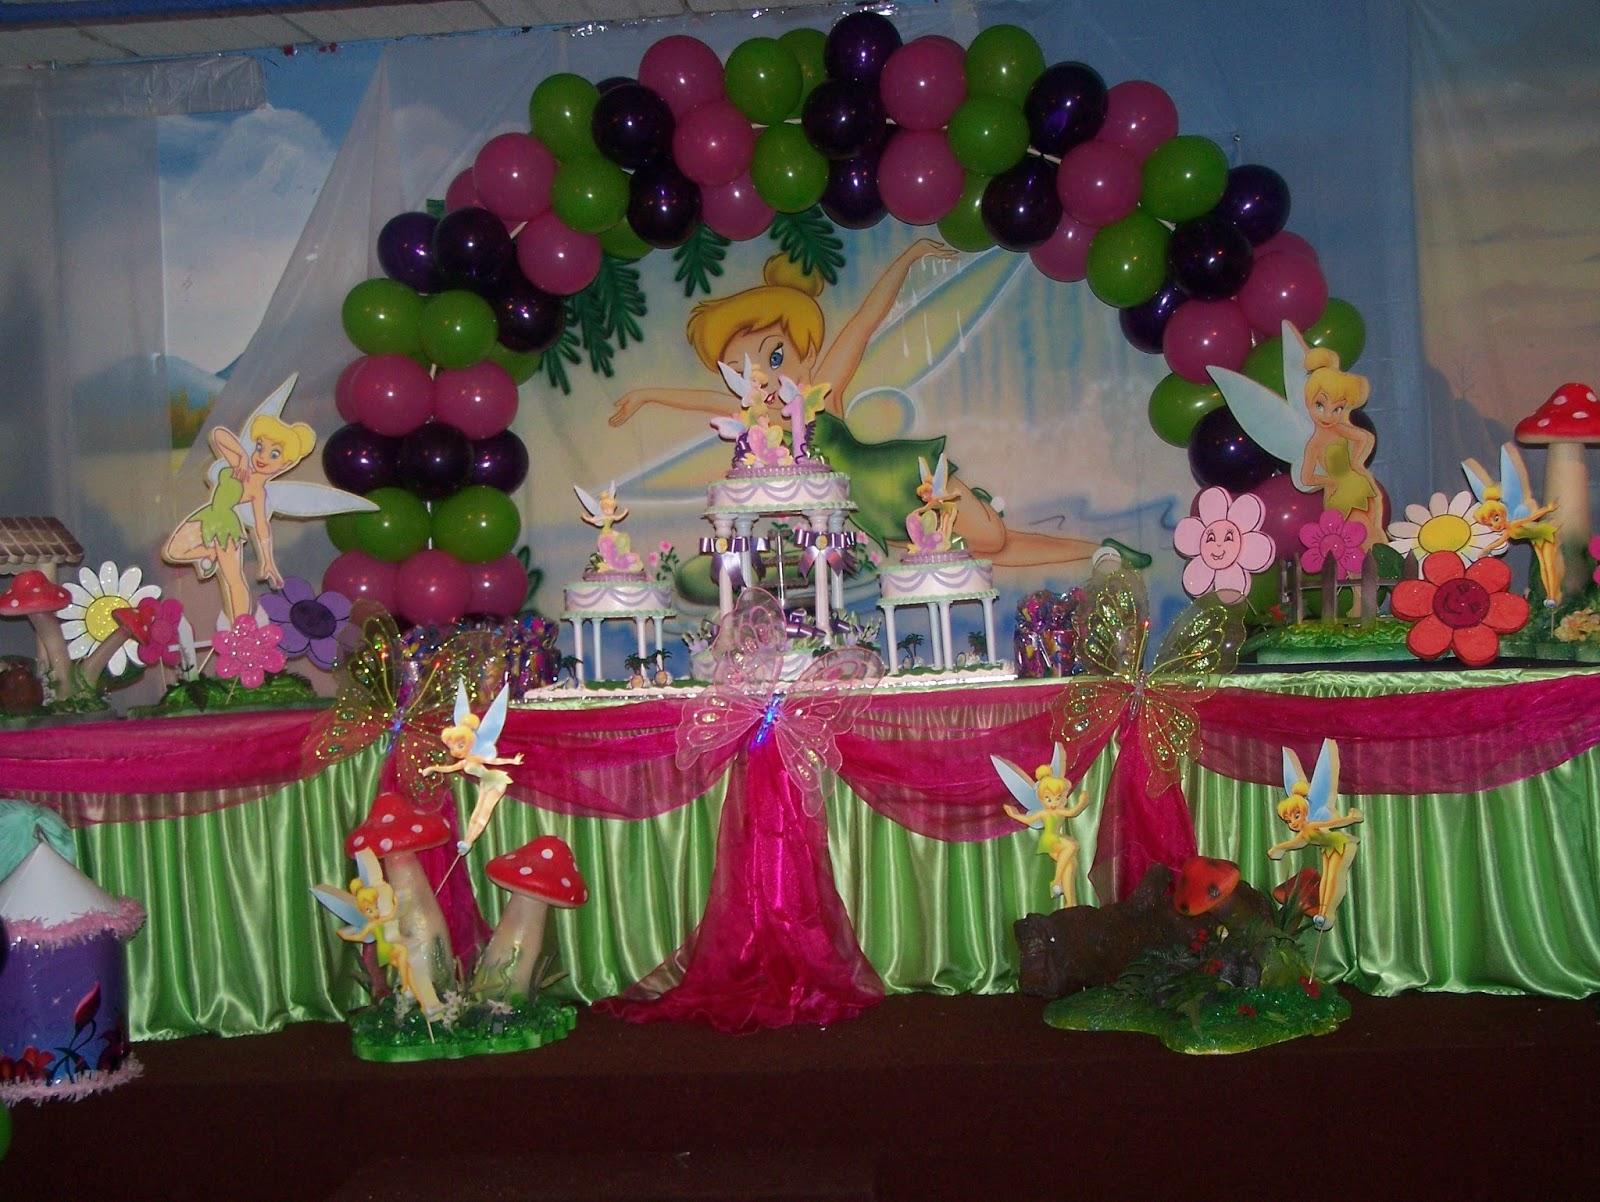 Decoracion tinkerbell para fiestas for Decoracion para pared fiesta